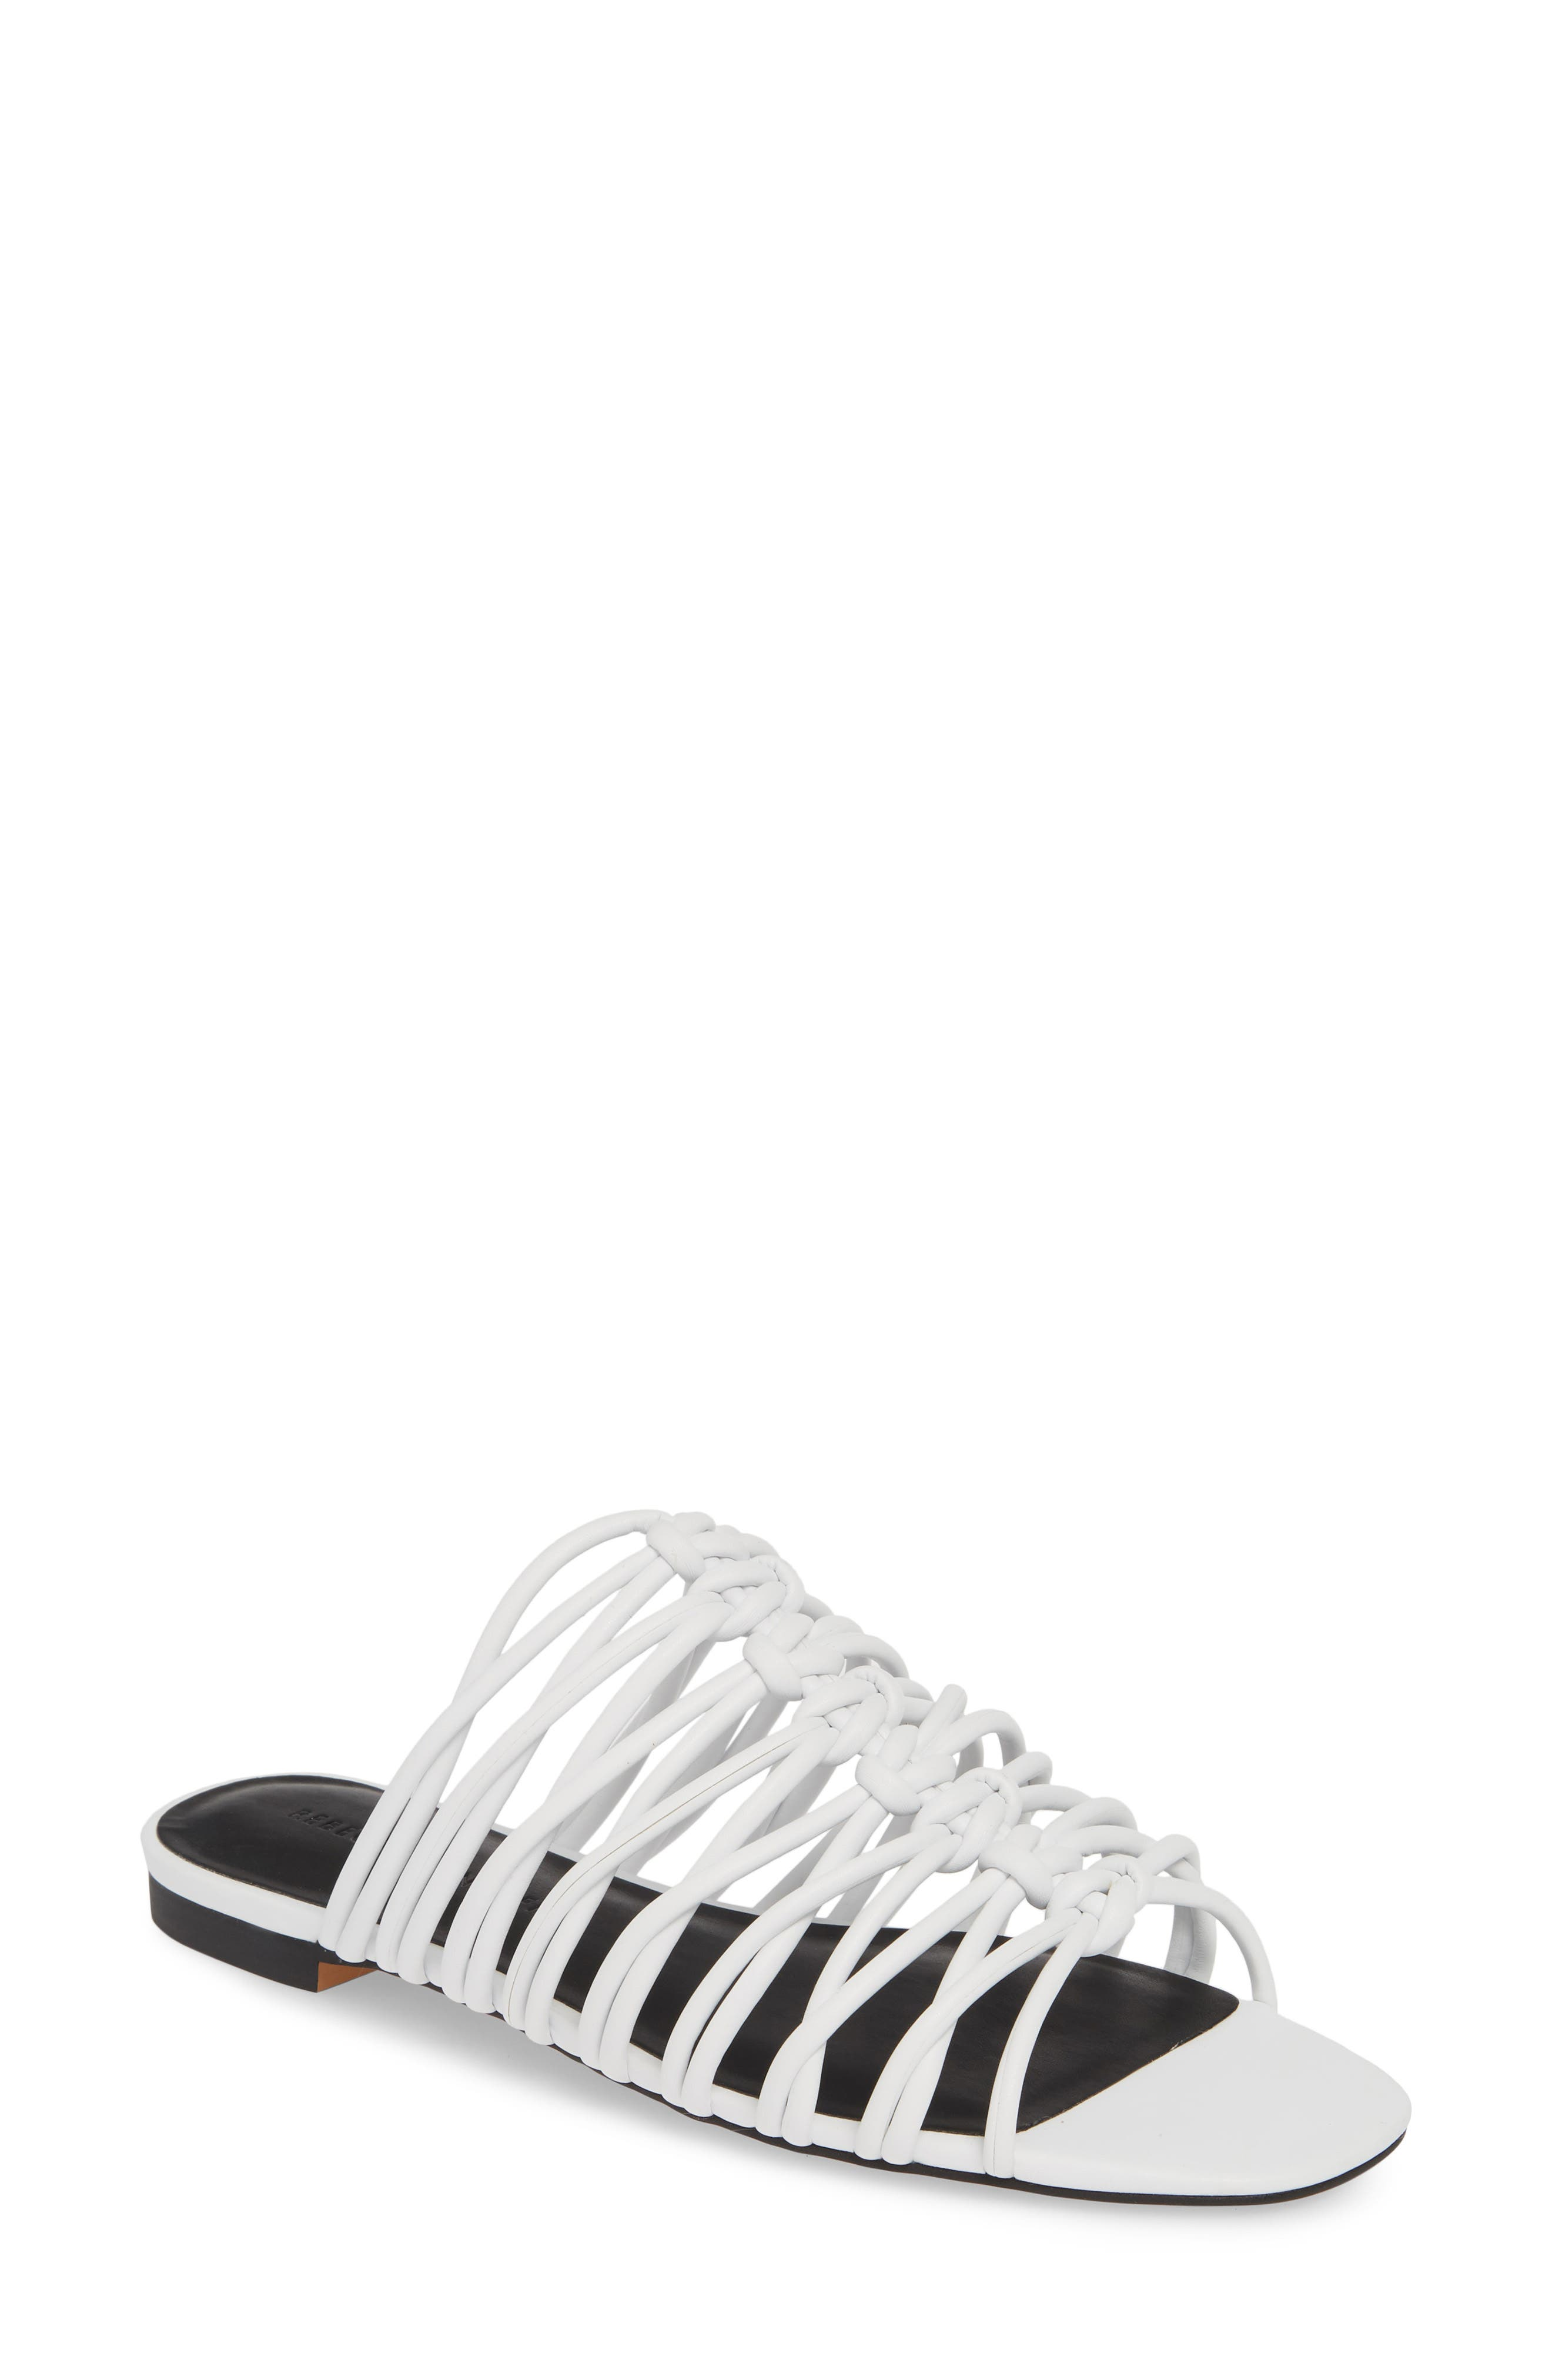 Rebecca Minkoff Maelynn Slide Sandal, White